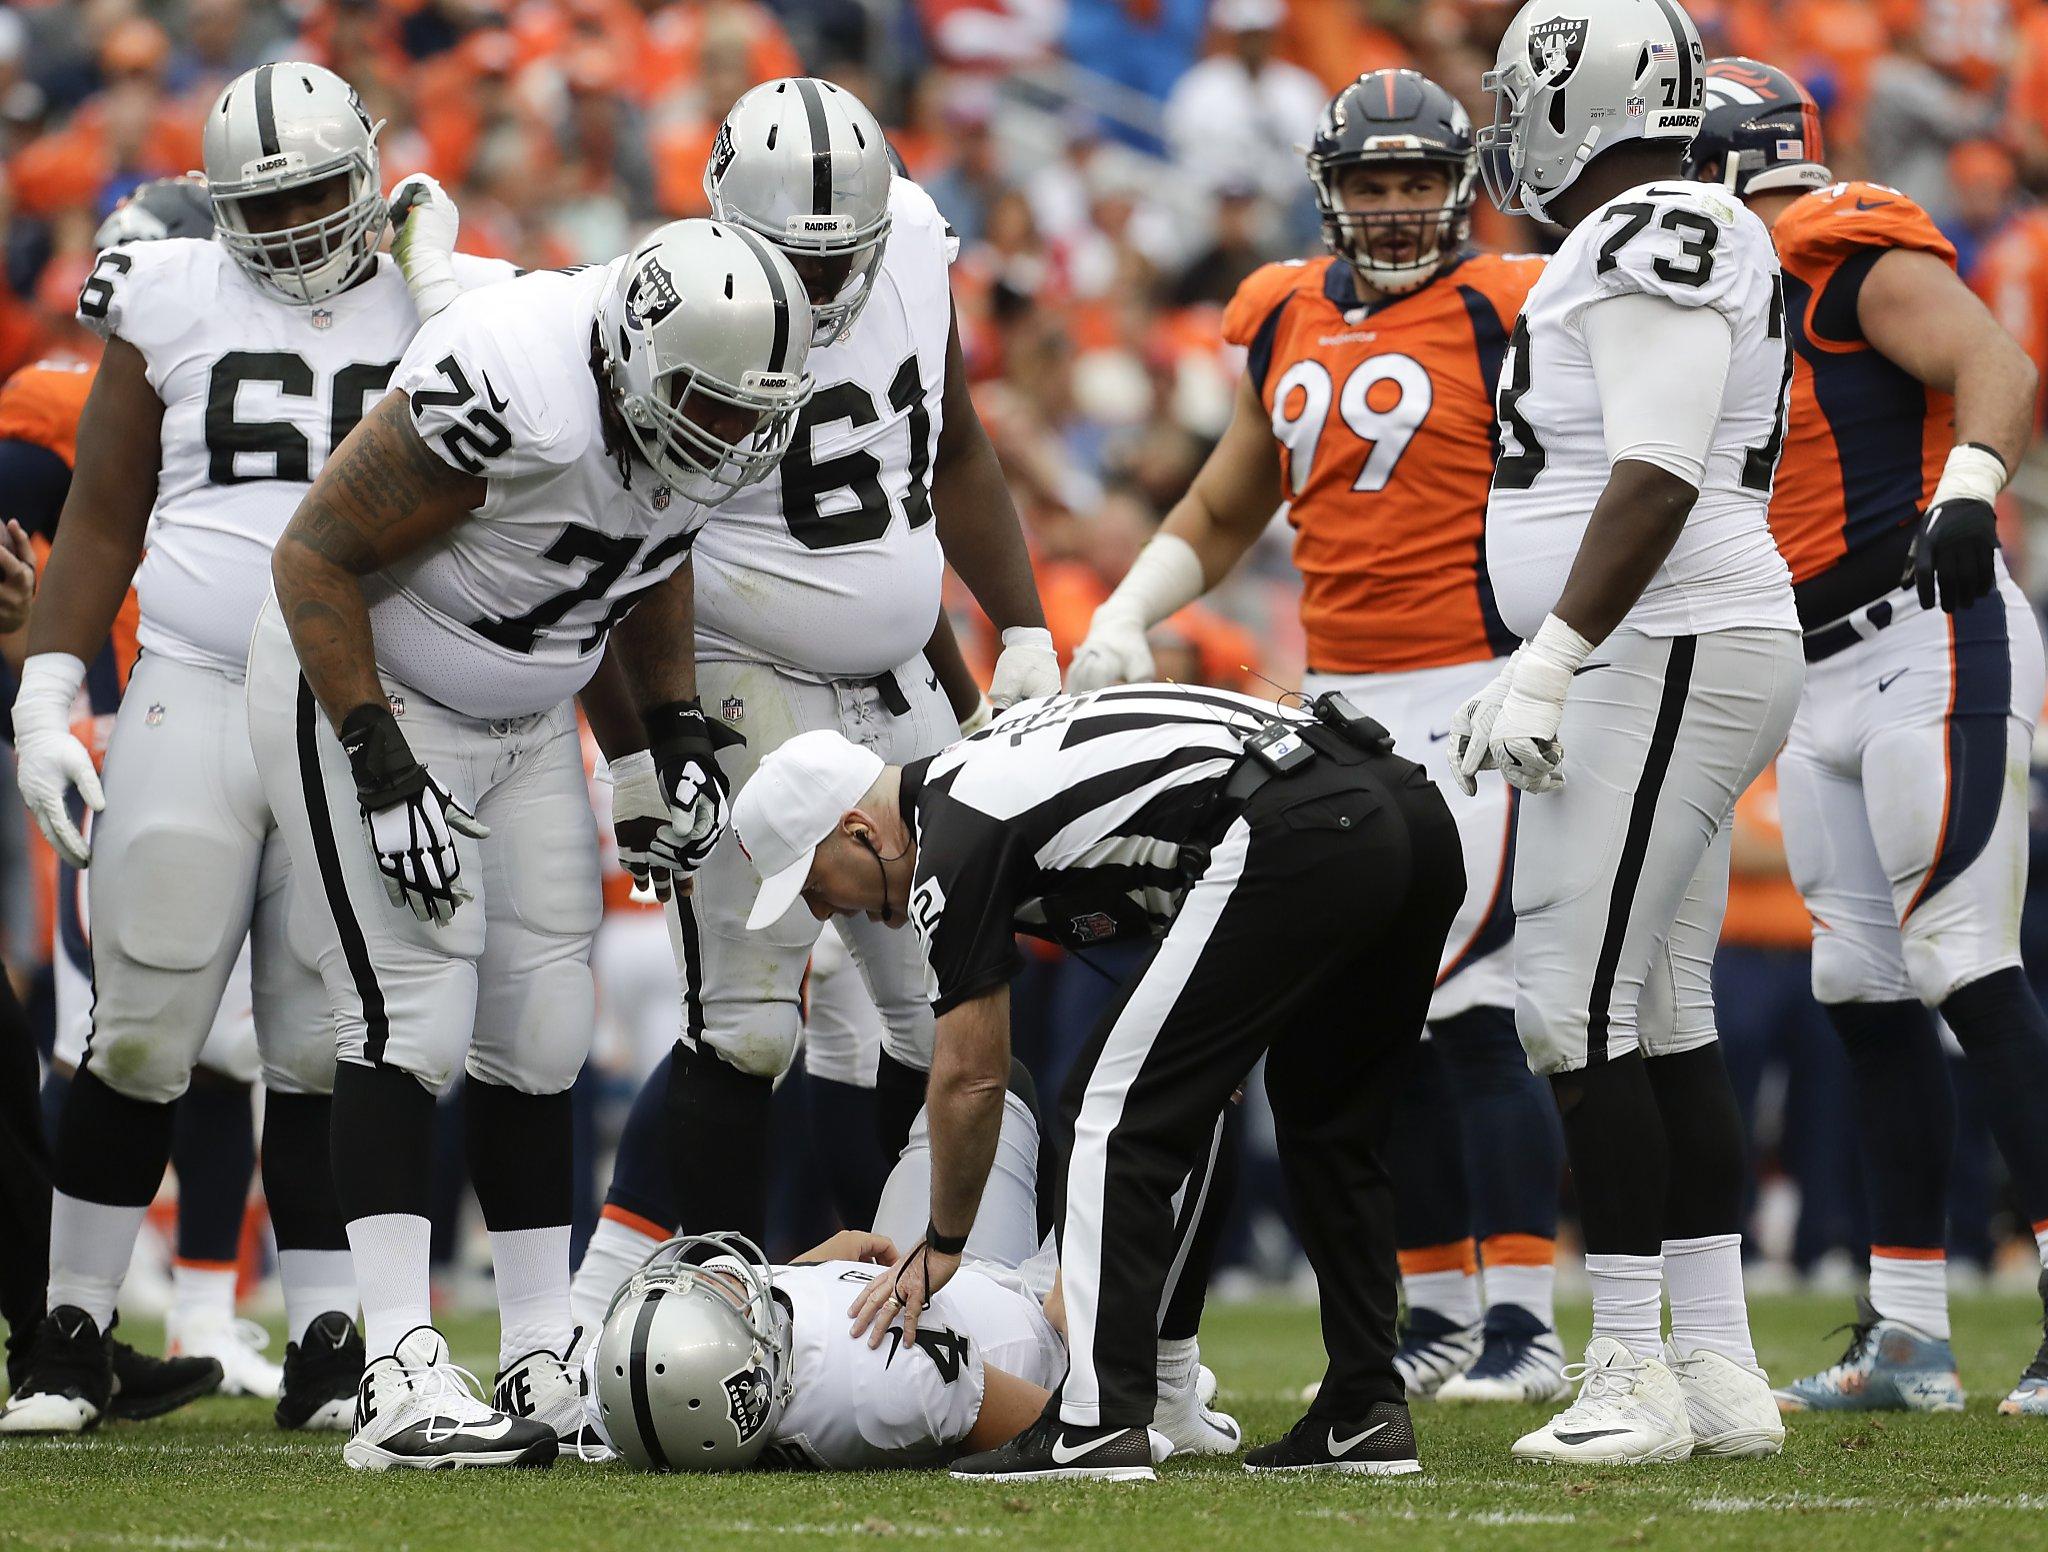 Derek Carr injury poses short term test of Raiders resilience